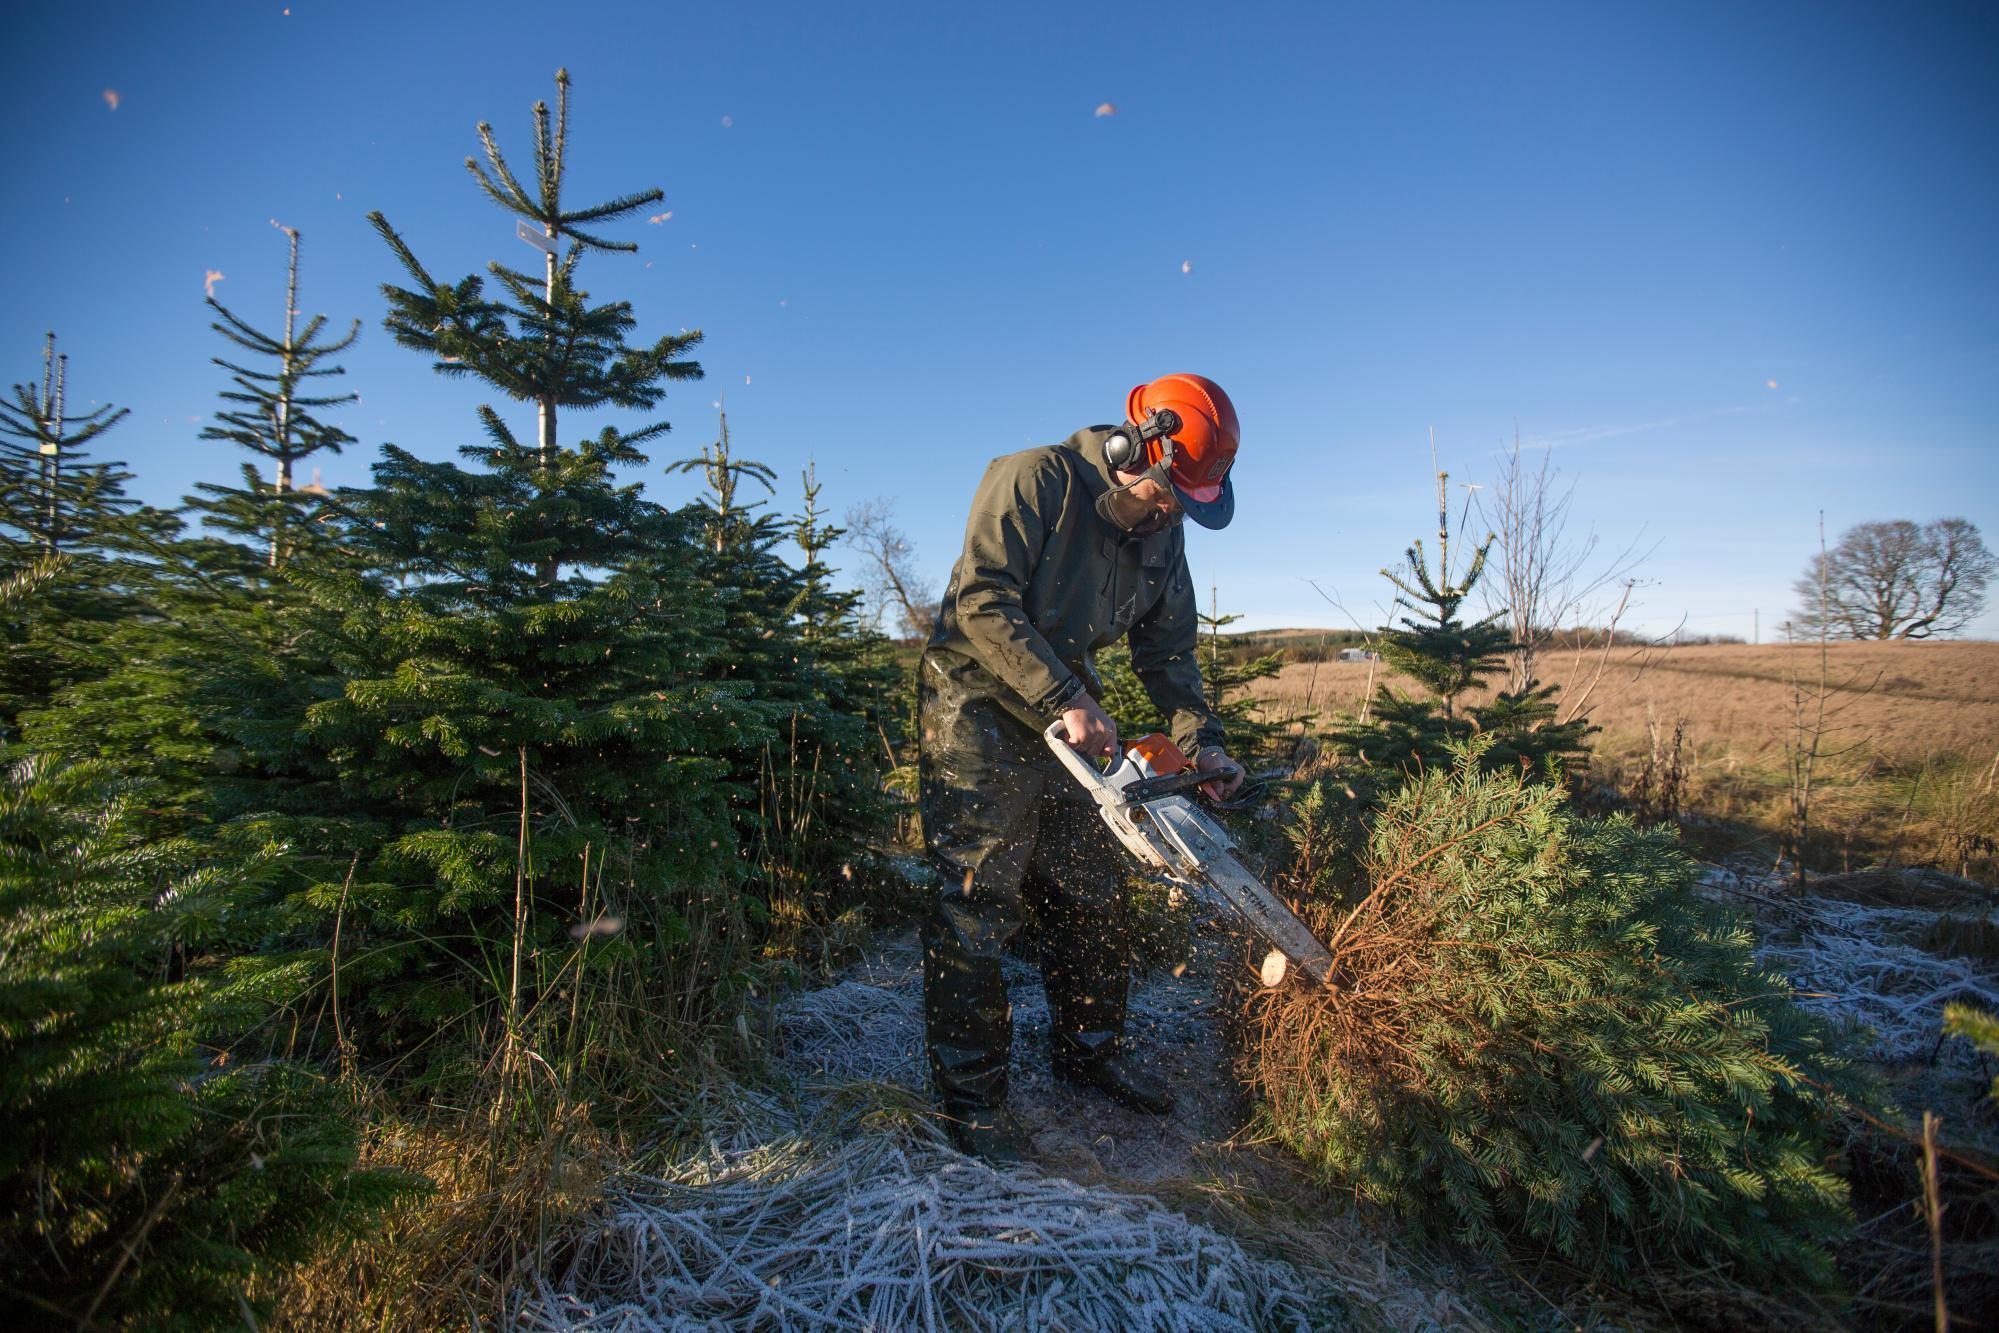 Cutting Down Christmas Trees on Edenmill Farm